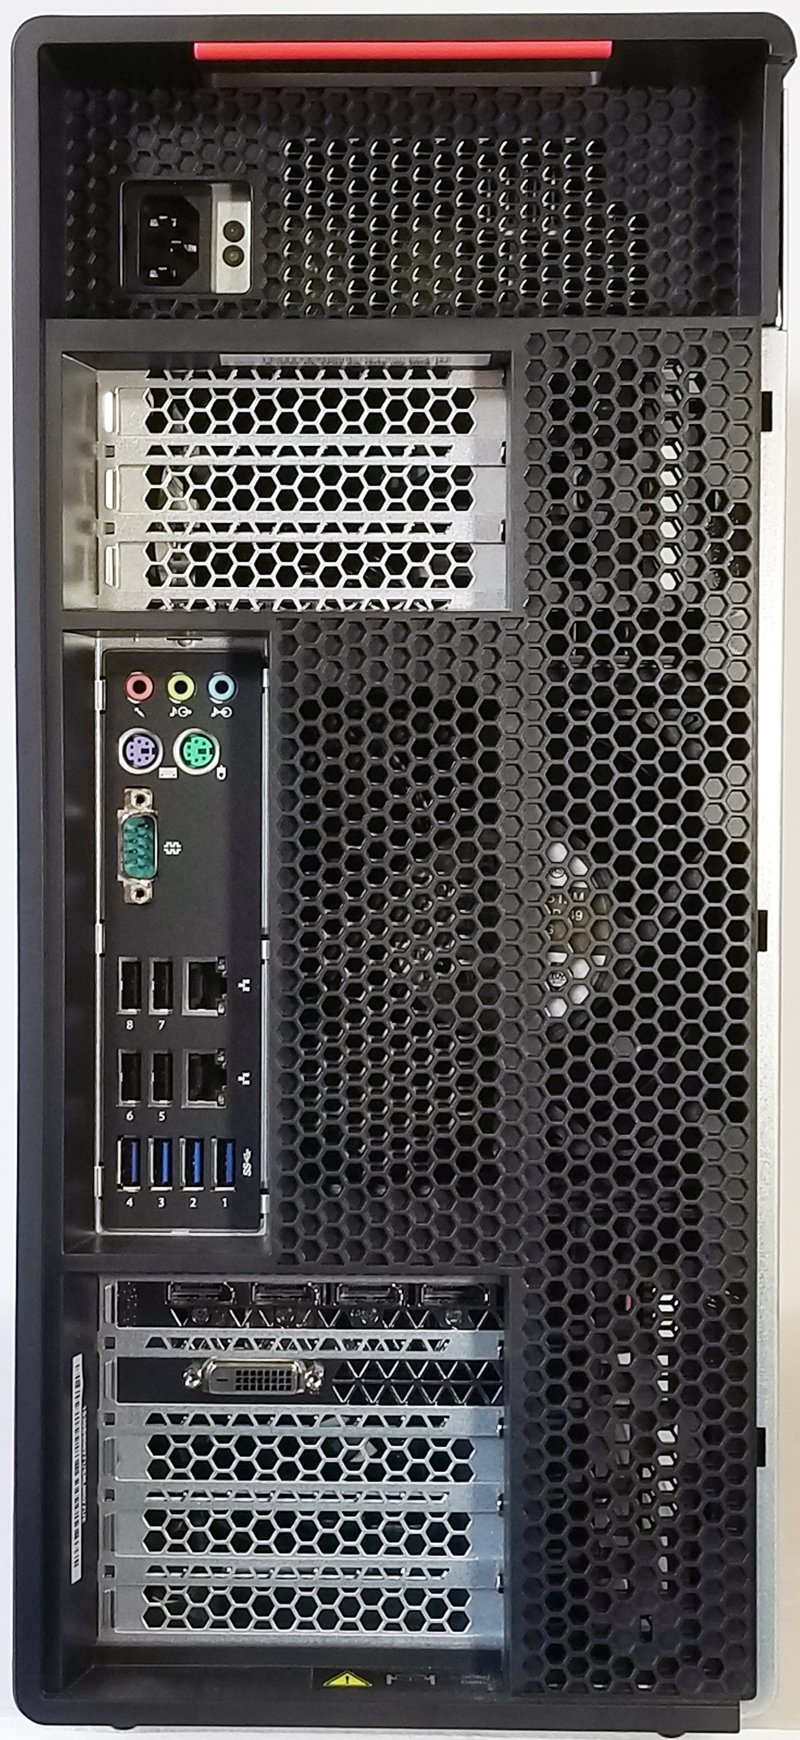 Lenovo ThinkStation P910 Review Advanced Dual Xeon